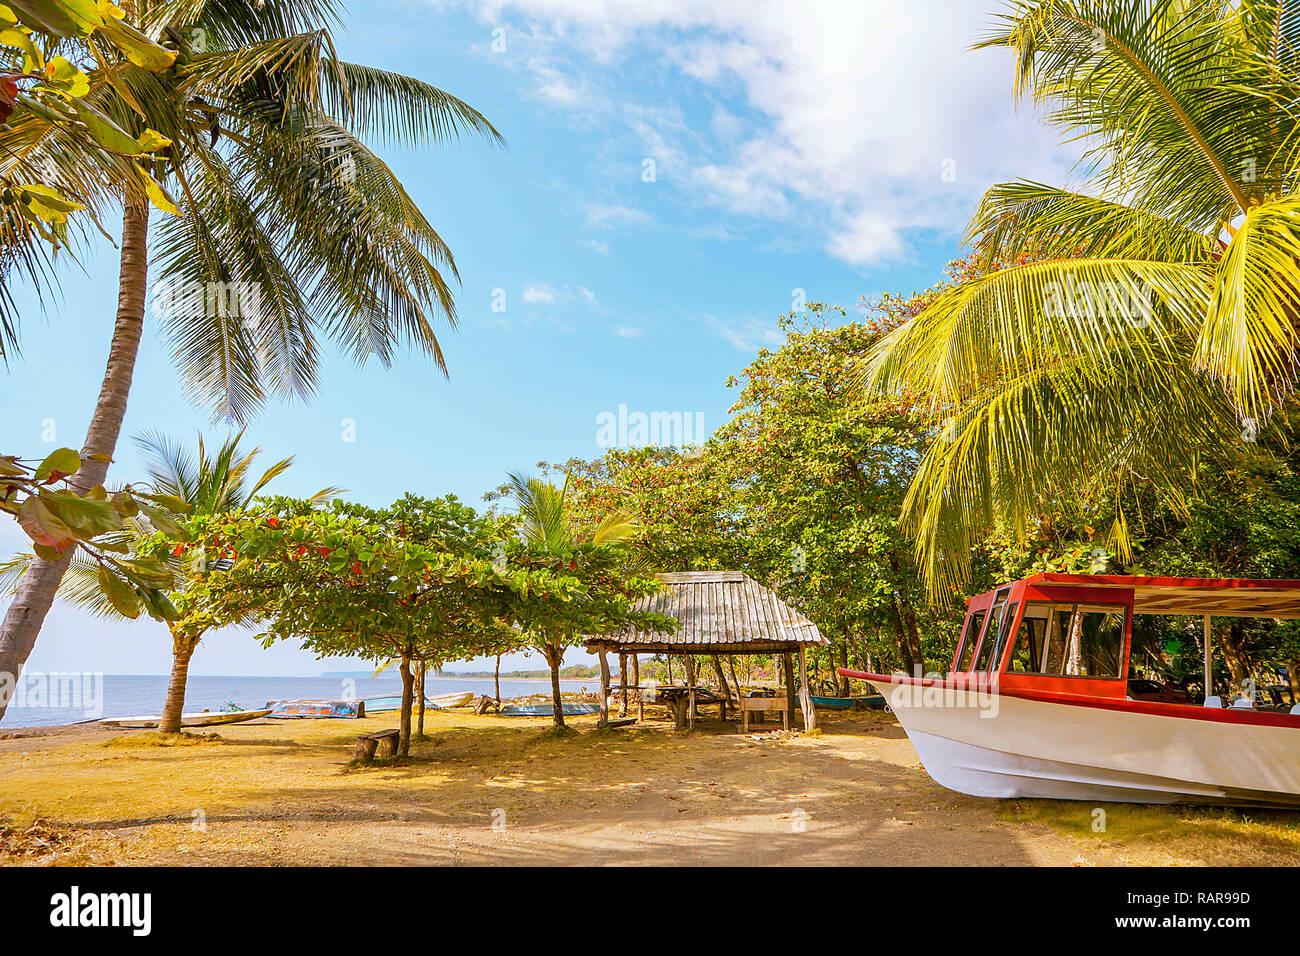 On the beach of Playa Tarcoles Costa Rica Stock Photo